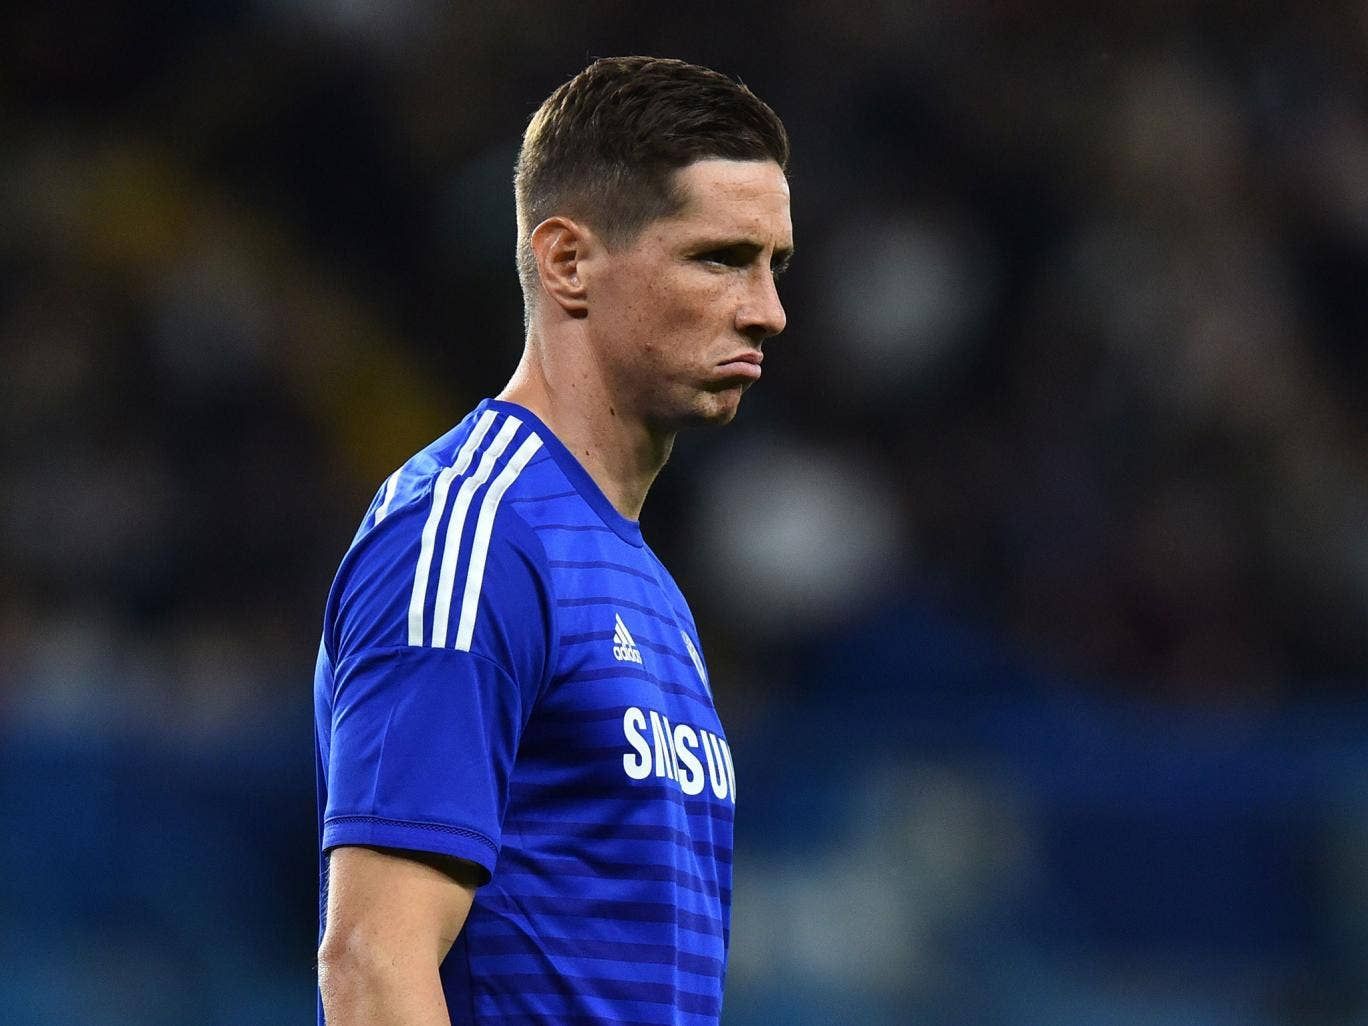 Fernando Torres has not scored in 266 minutes of pre-season for Chelsea